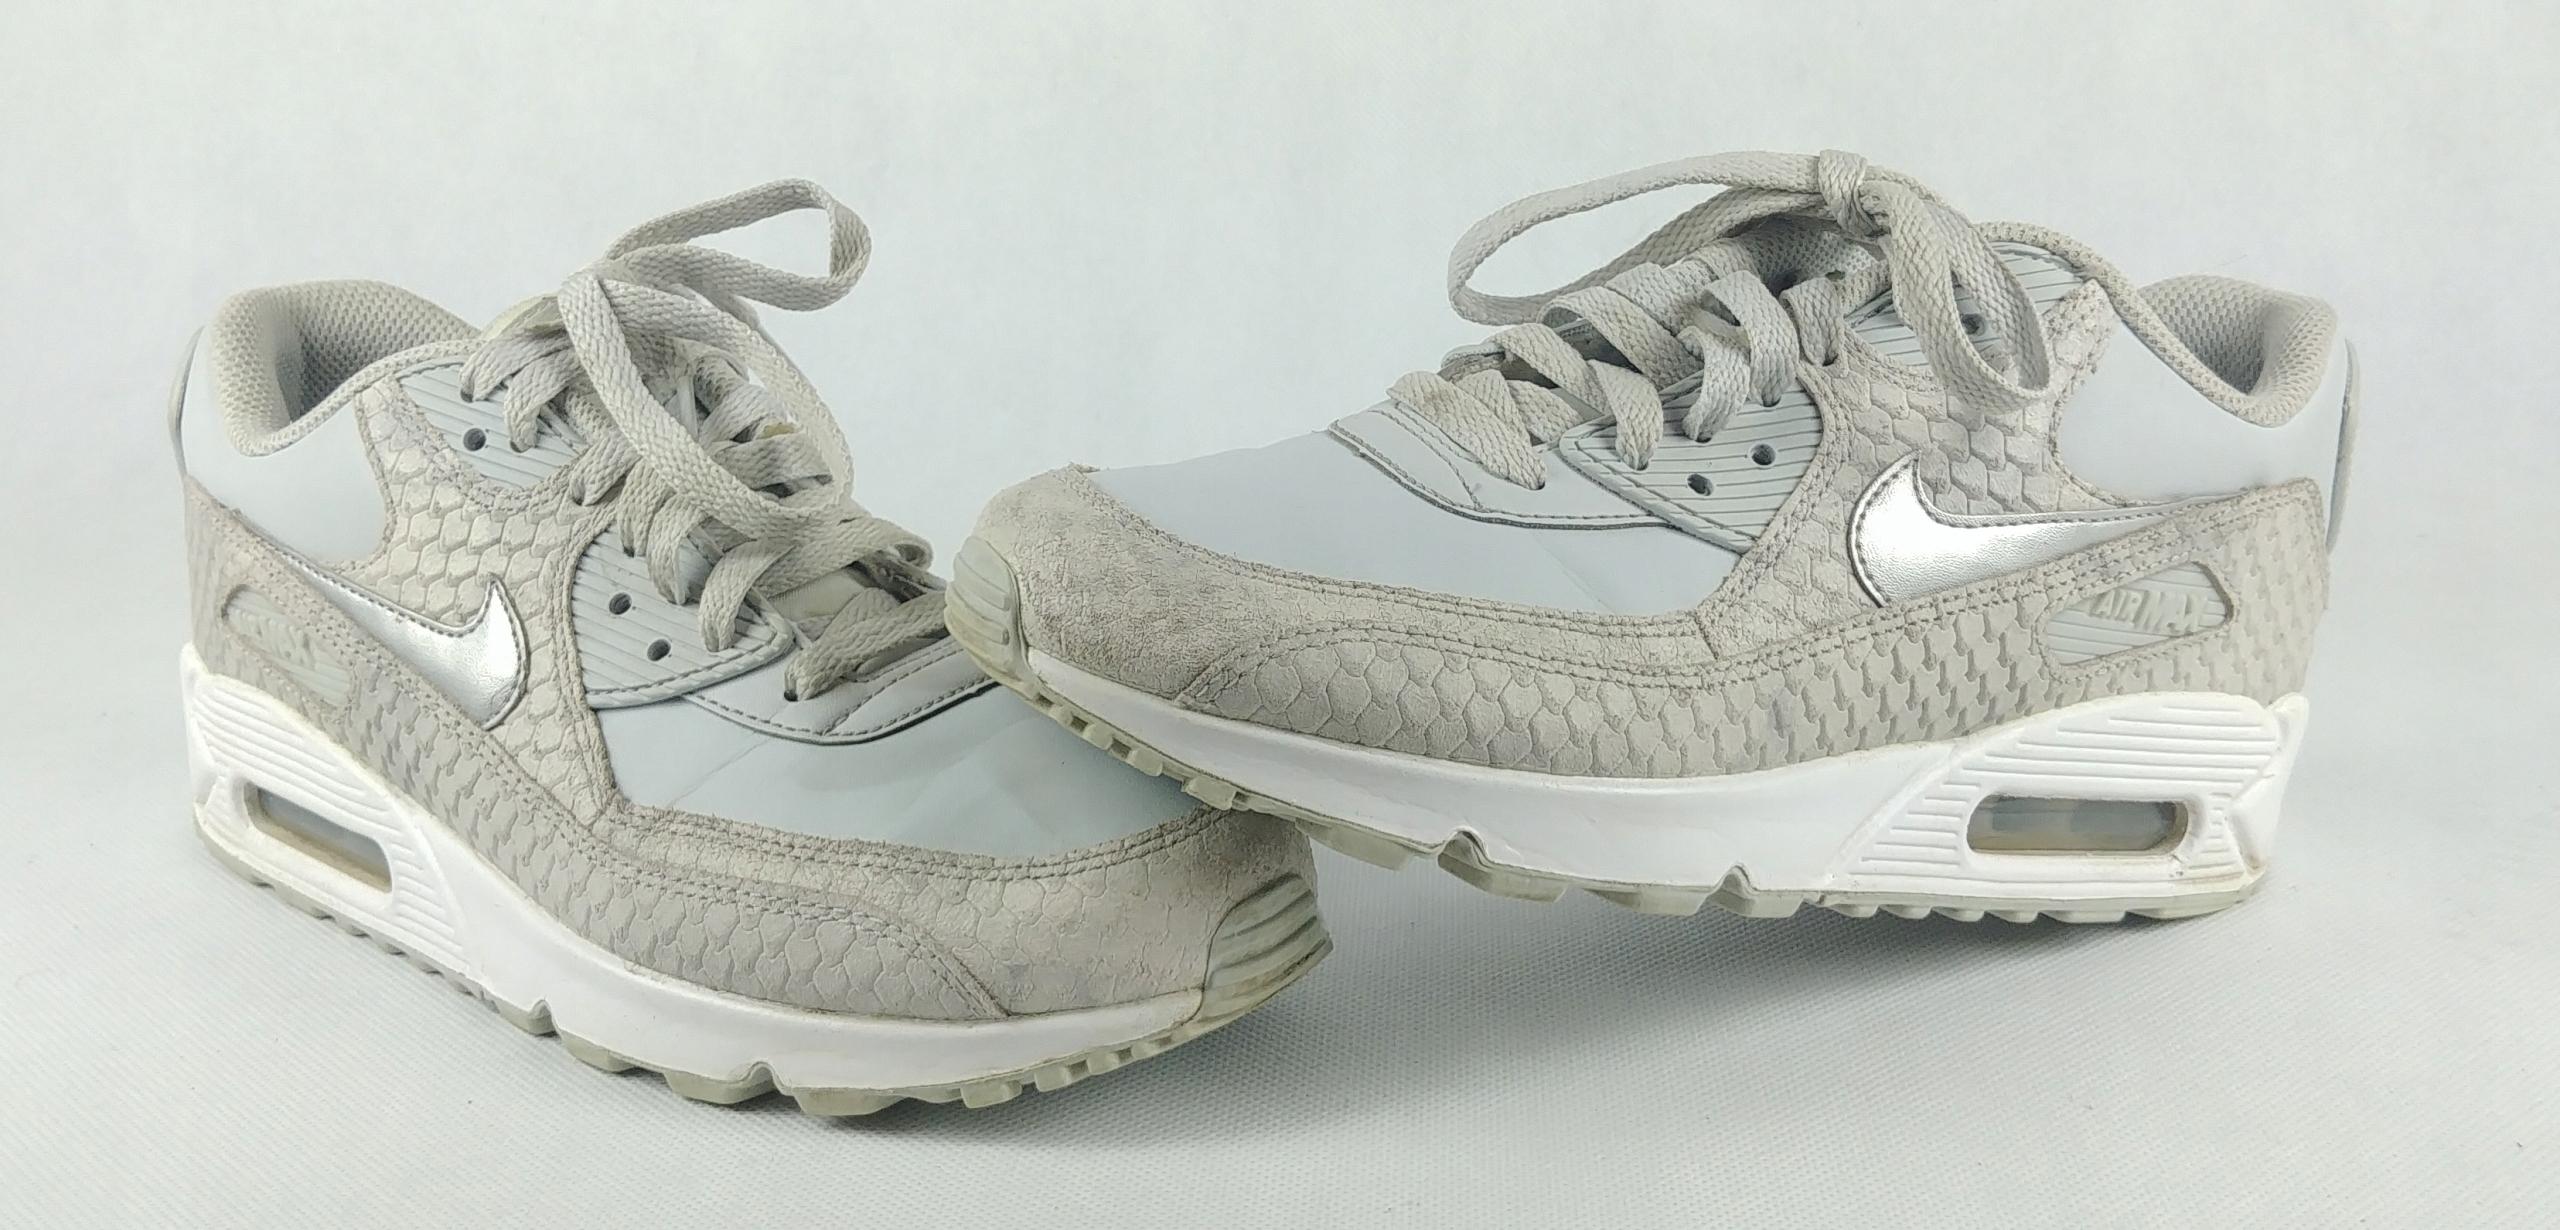 NIKE AIR MAX 90 adidasy damskie sportowe buty 38